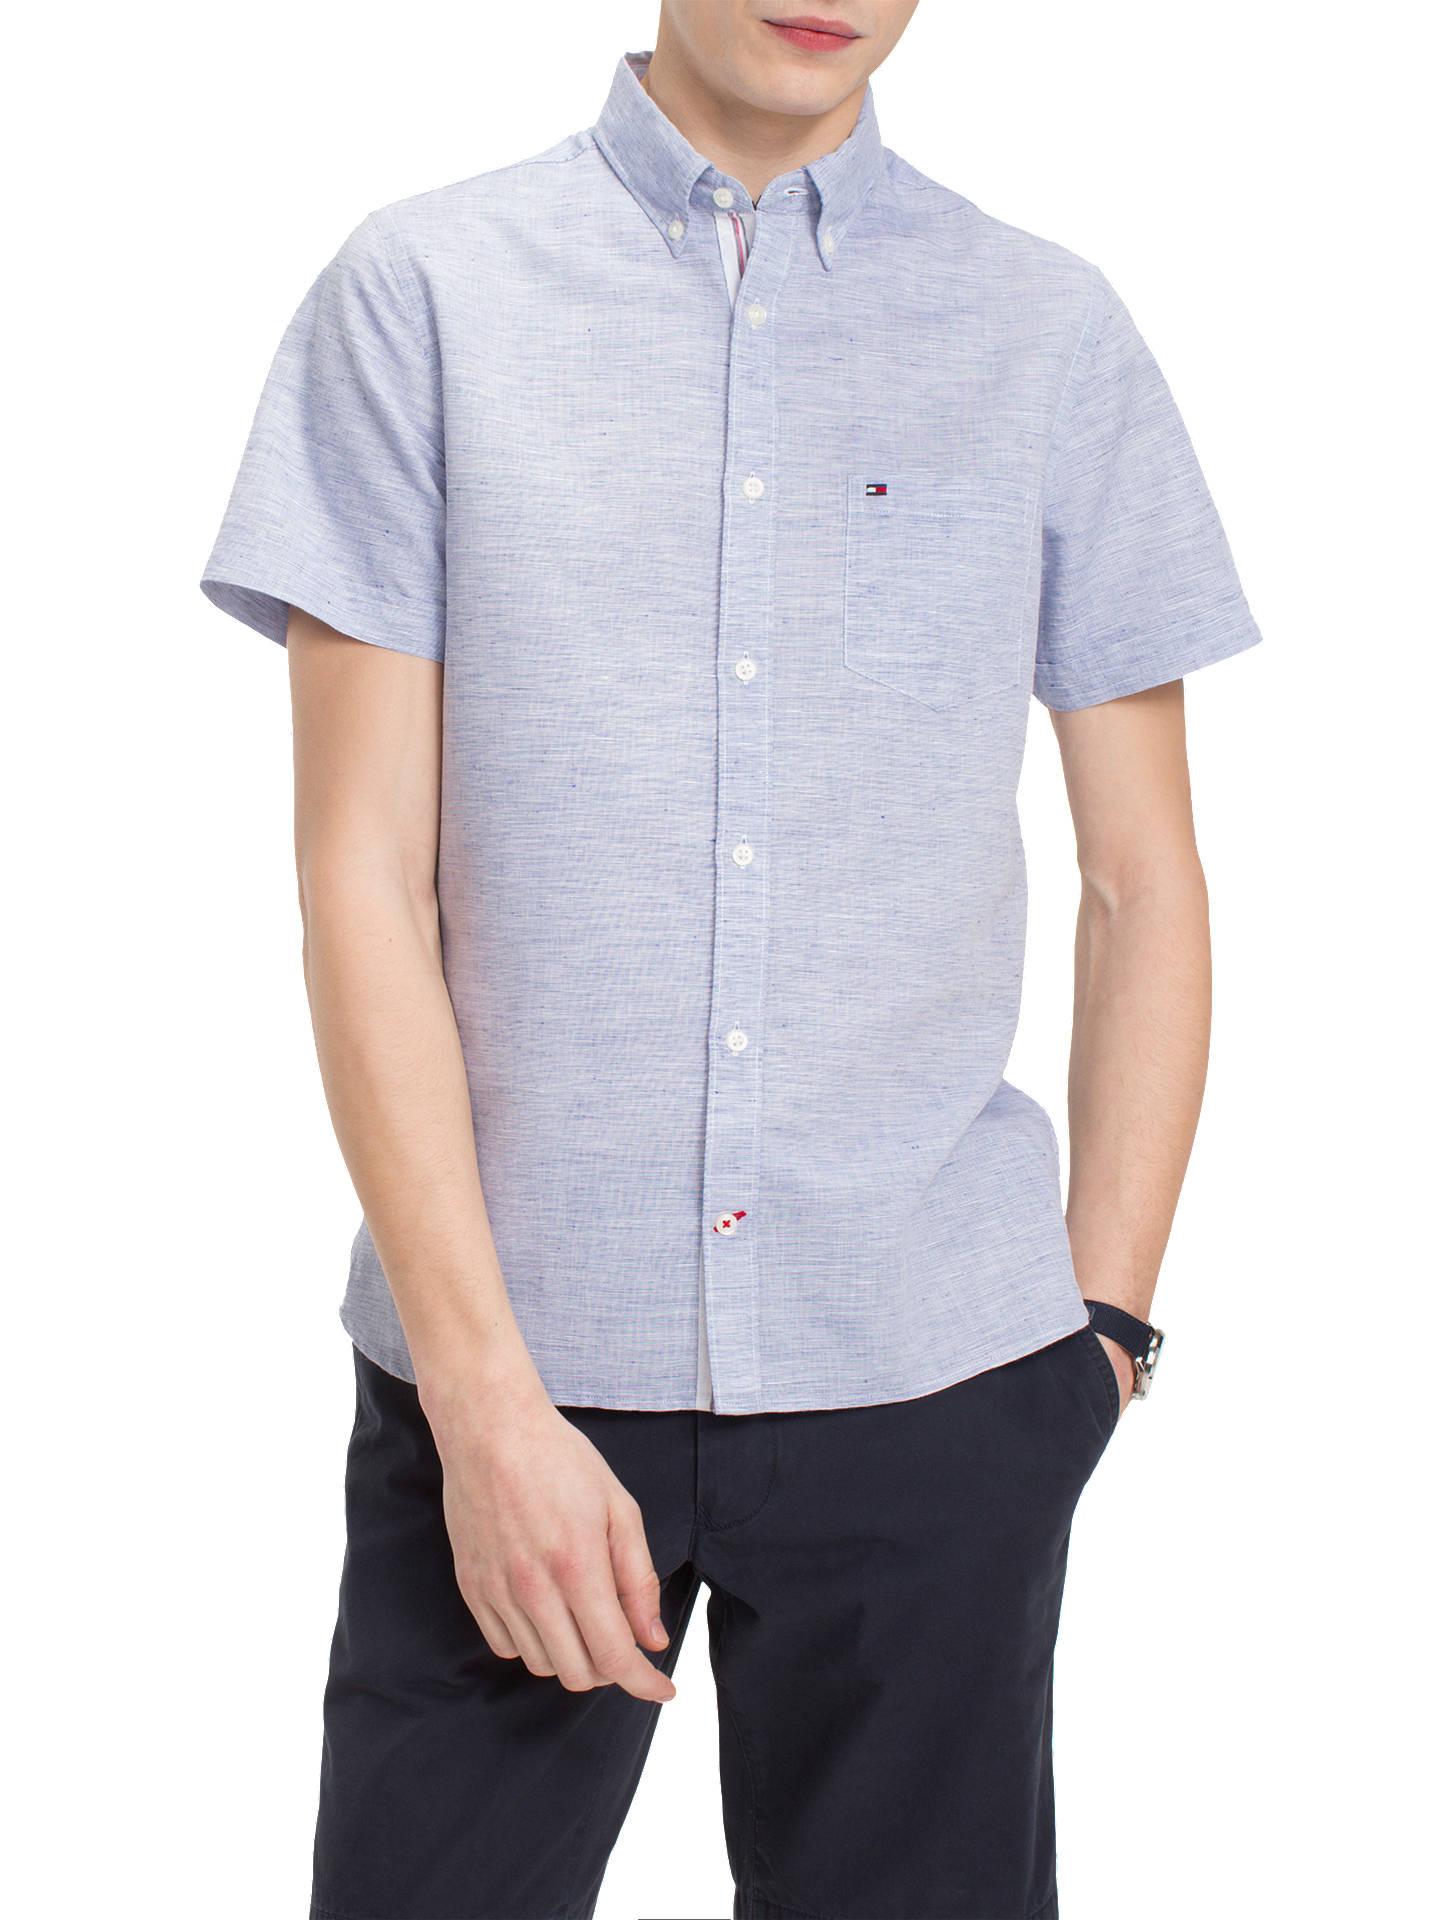 Tommy Hilfiger Short Sleeve Shirt in